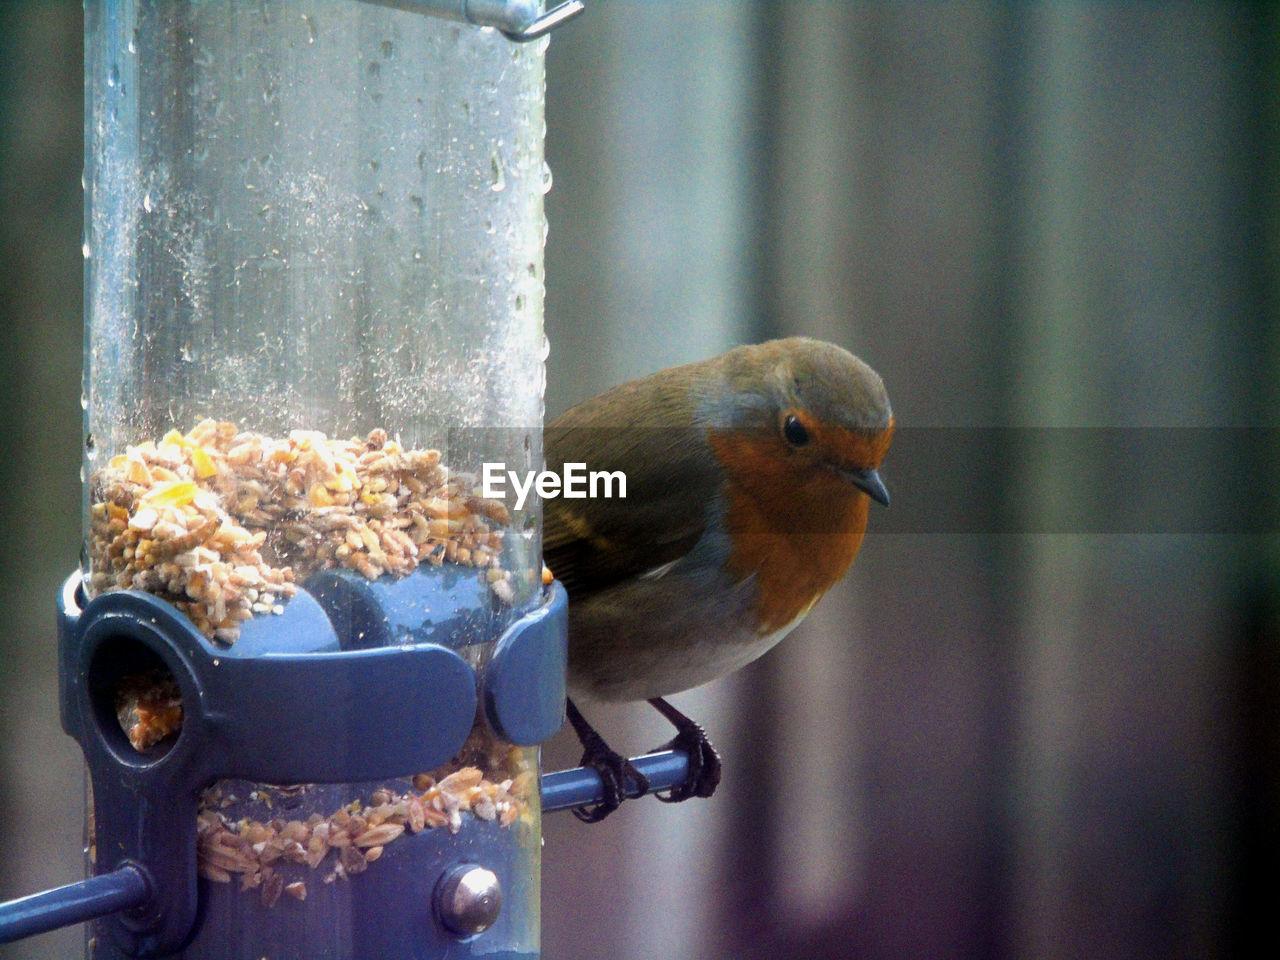 Robin Perching On Wet Bird Feeder